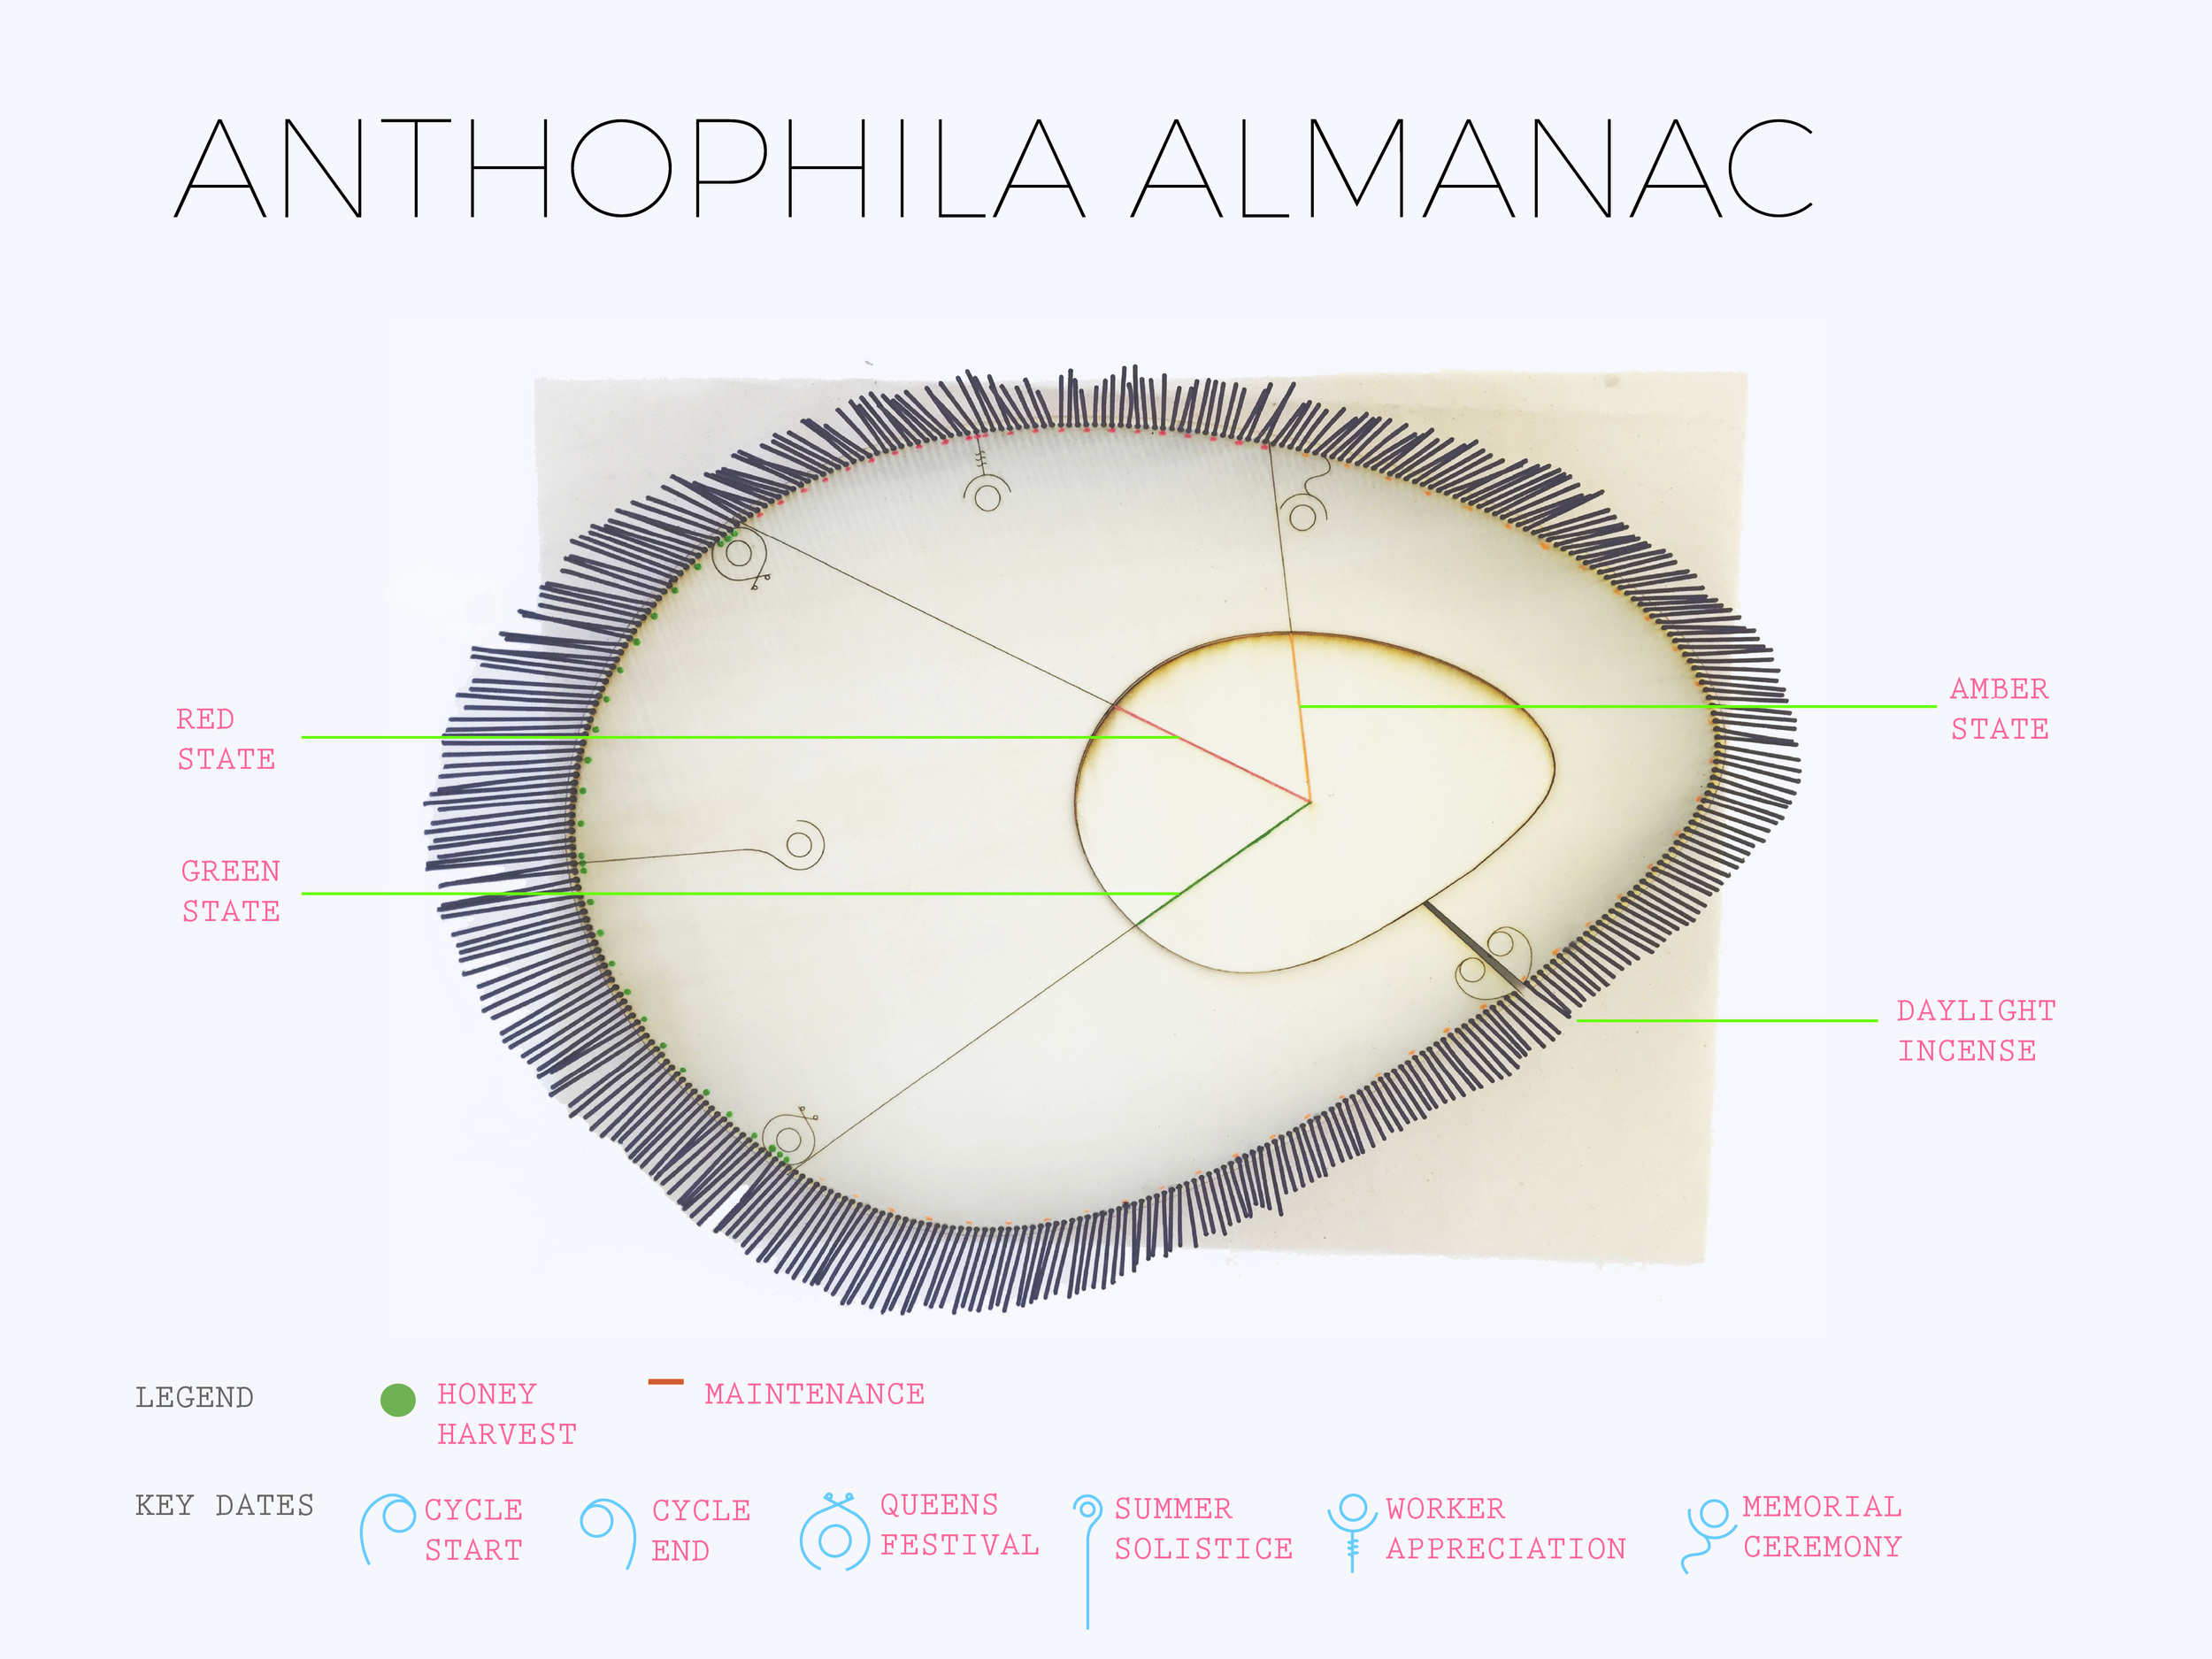 Anthophila Reveries: Speculative Calendar Prototype